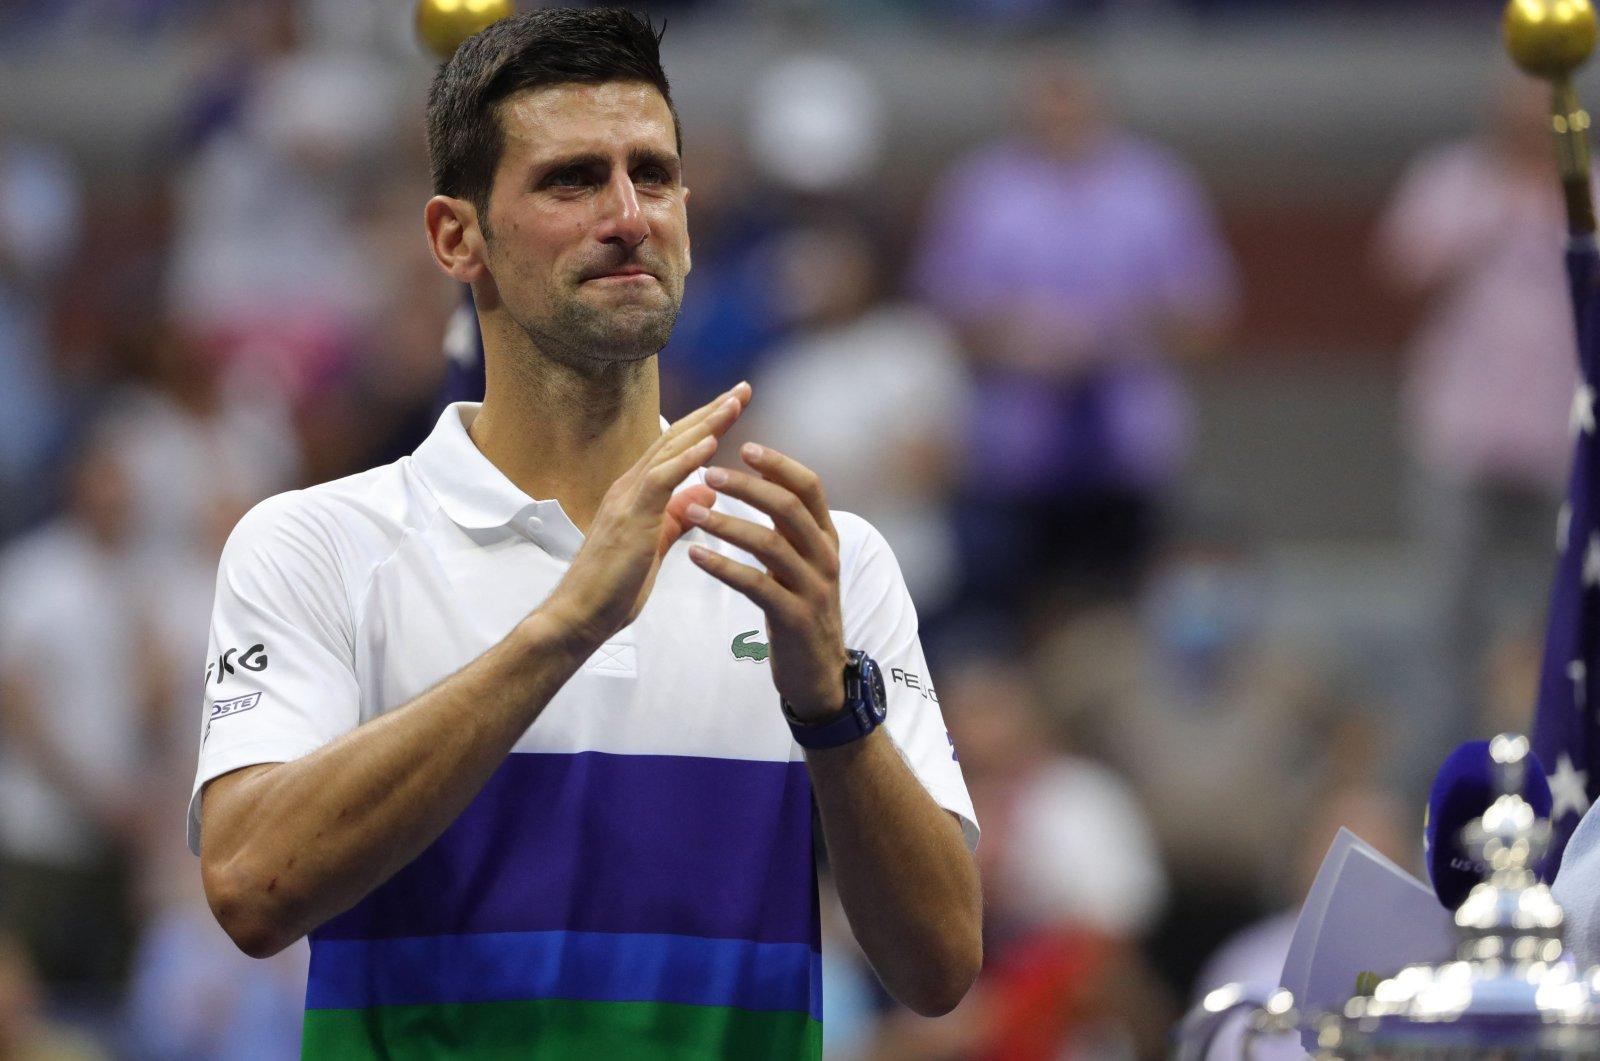 Serbia's Novak Djokovic reacts after the 2021 U.S. Open tennis final in New York, U.S., Sept. 12, 2021. (AFP Photo)